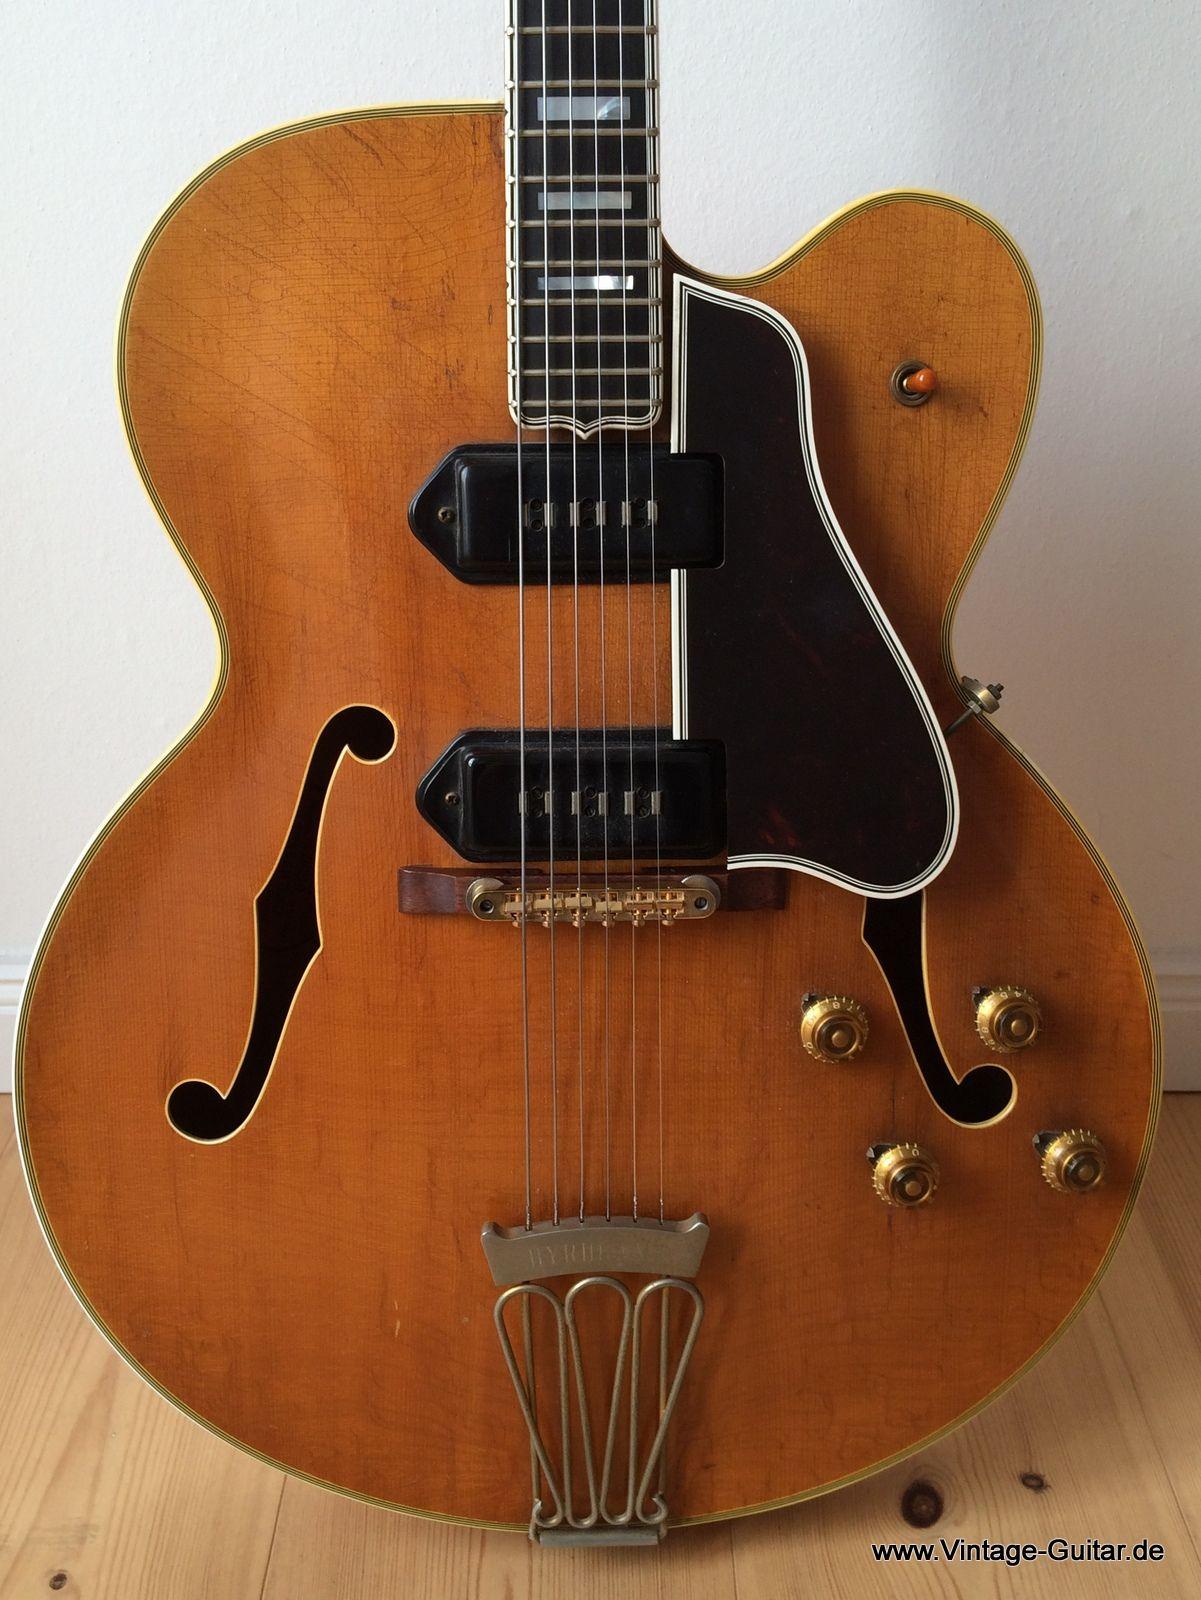 Gibson_Byrdland_1957-natural-alnicos